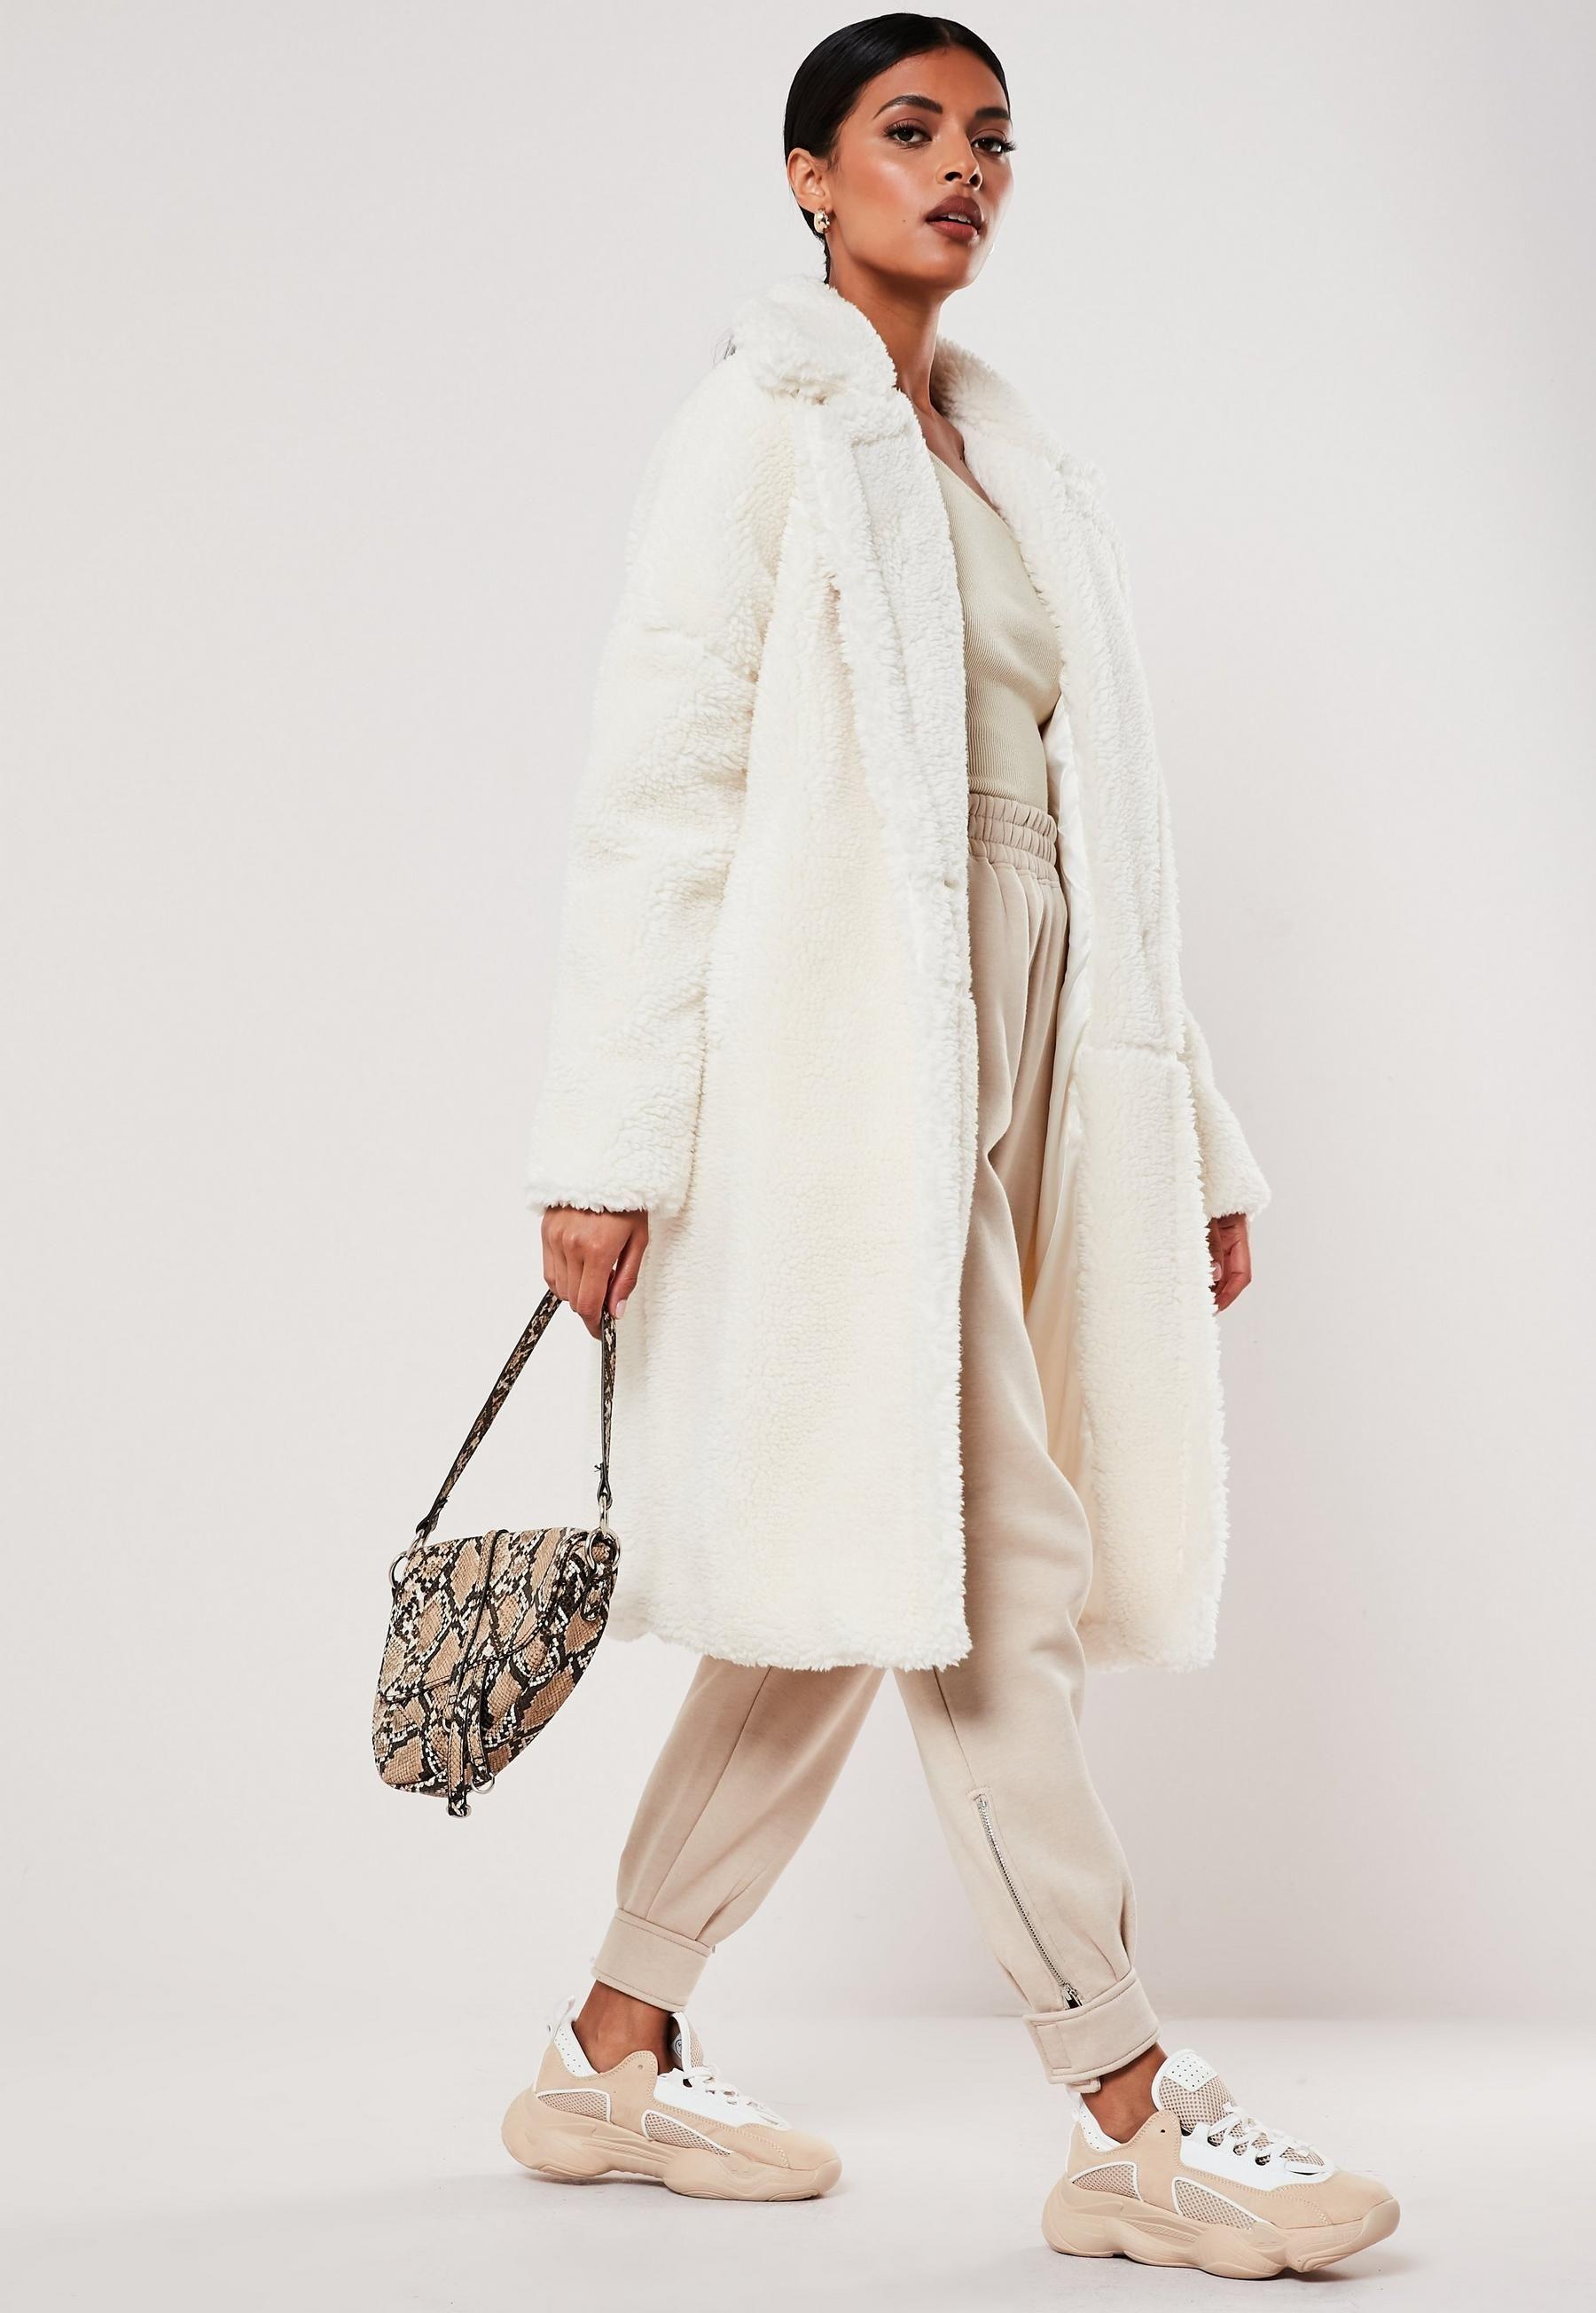 White Teddy Borg Oversized Coat Missguided Coats Jackets Women Coats For Women Coat [ 2608 x 1800 Pixel ]